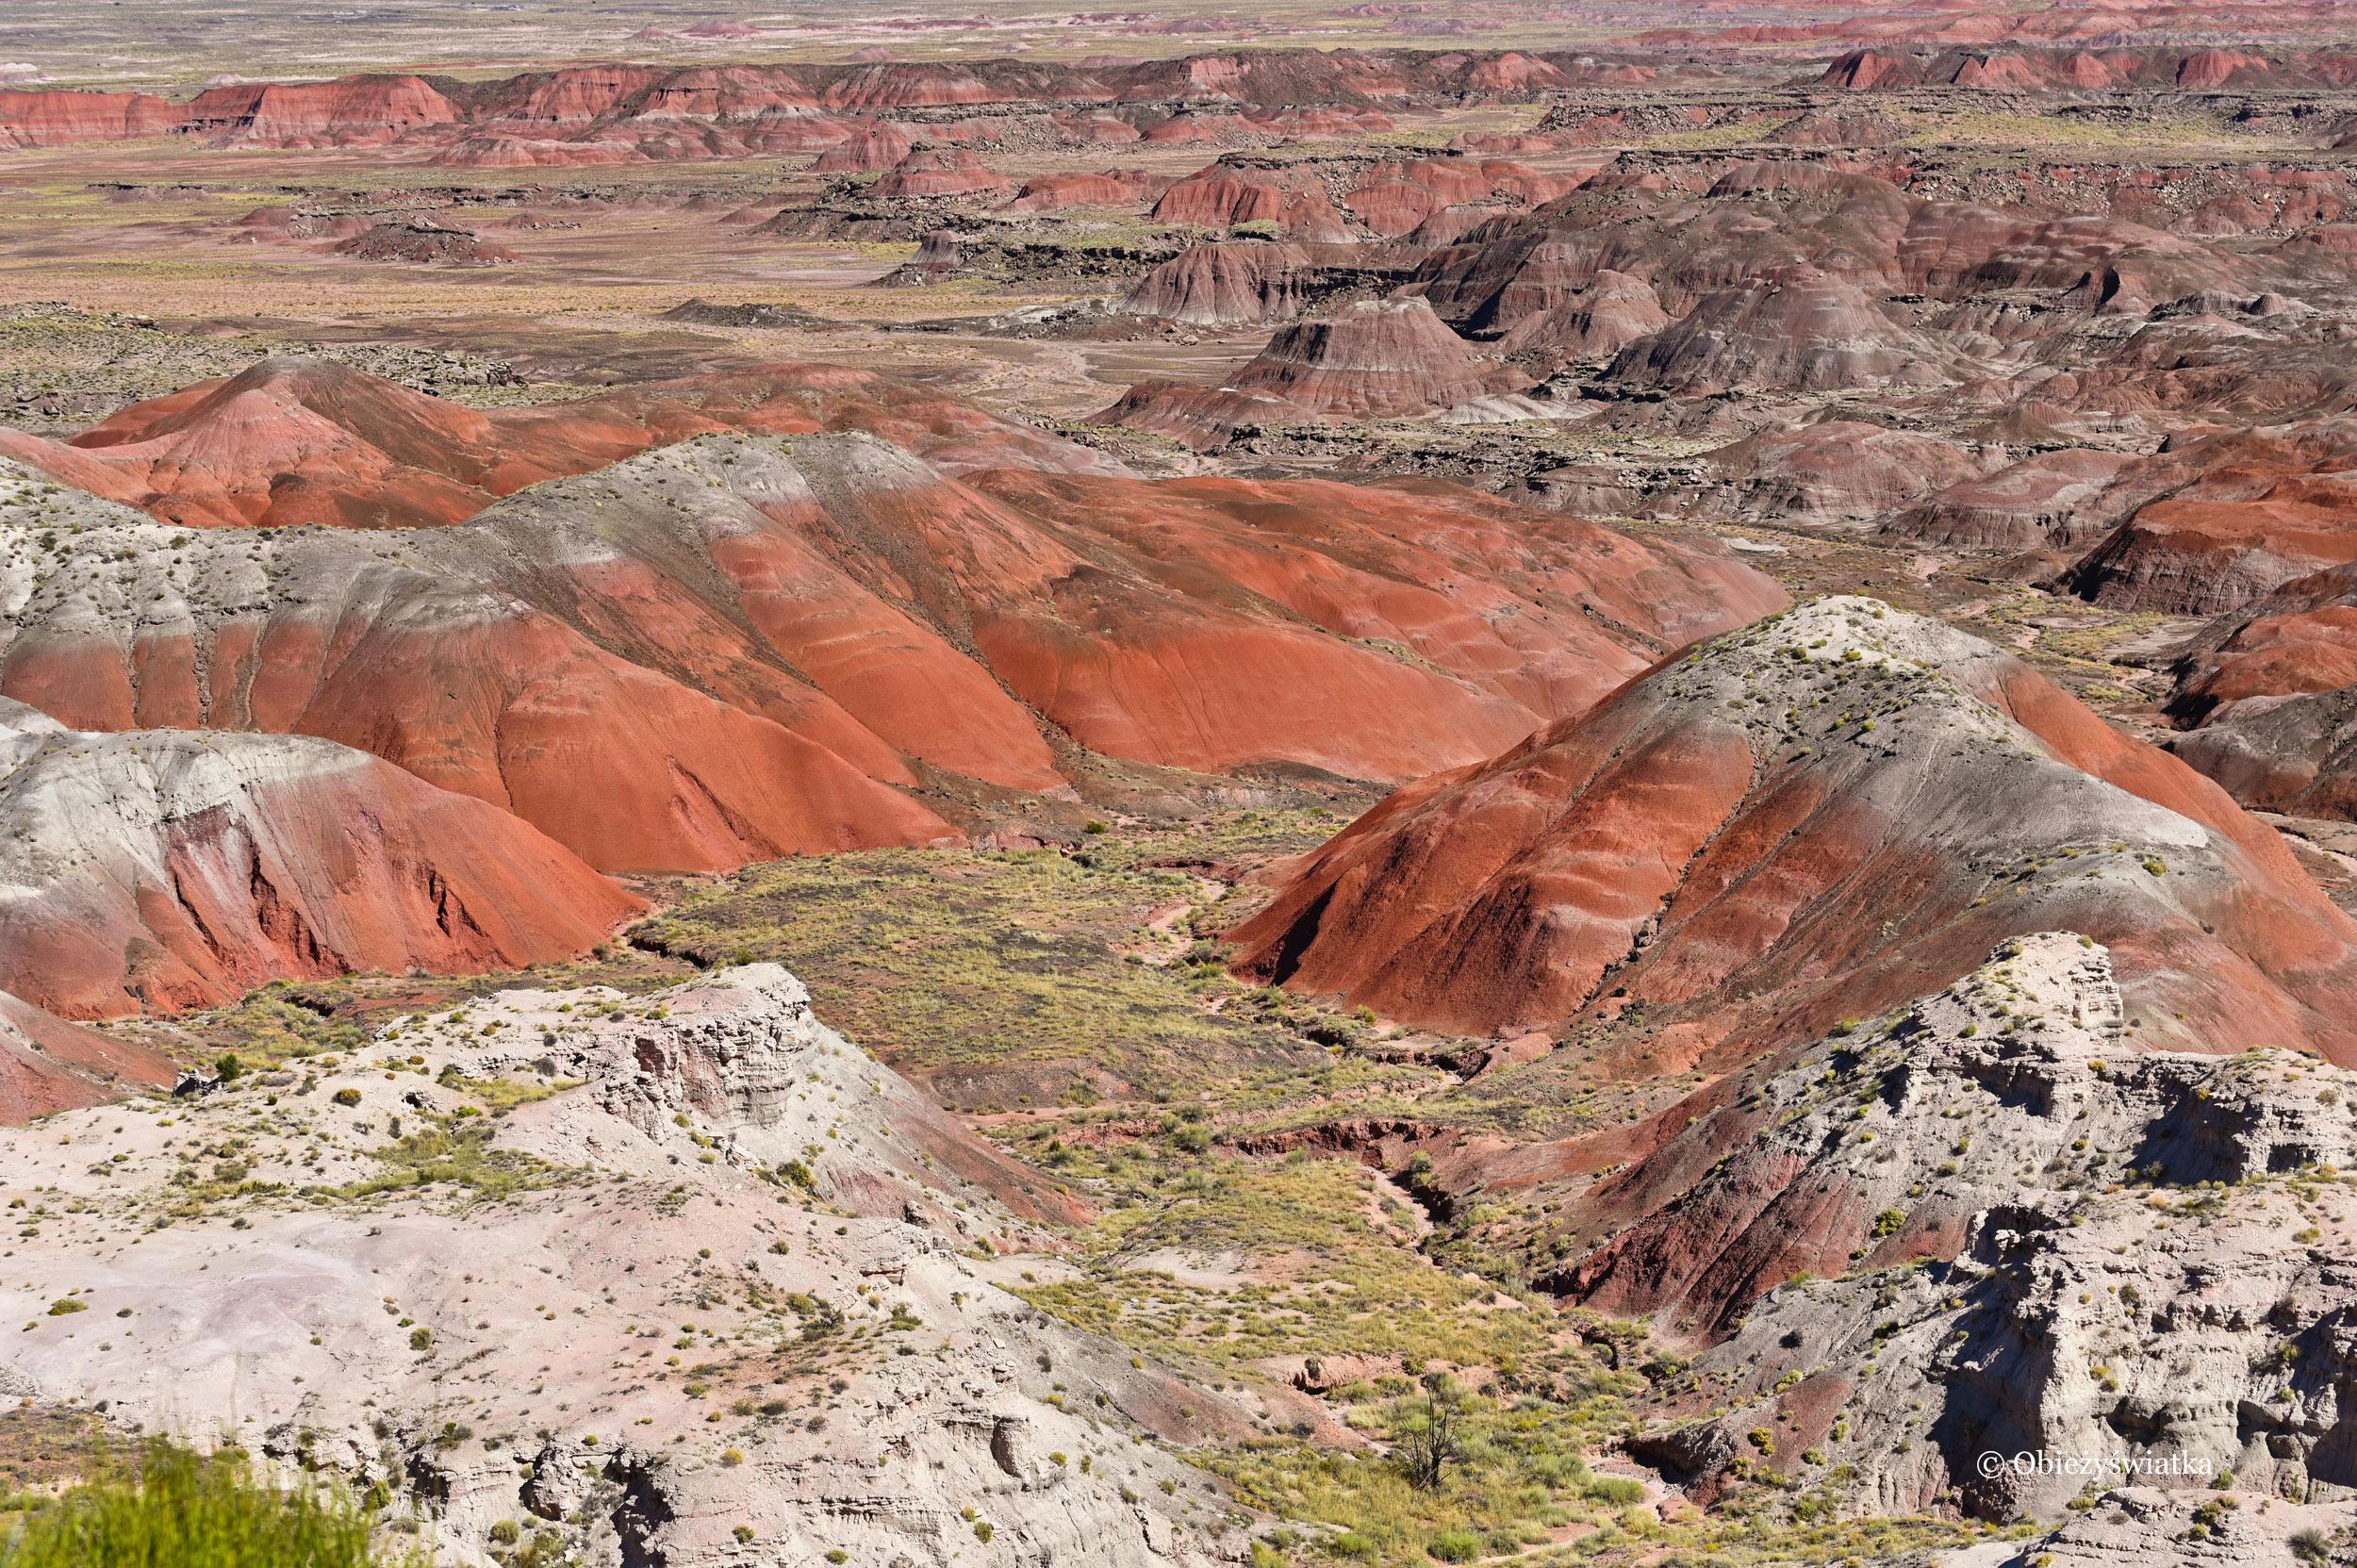 Kolorowe wzgórza - Painted Desert, Petrified Forest National Park